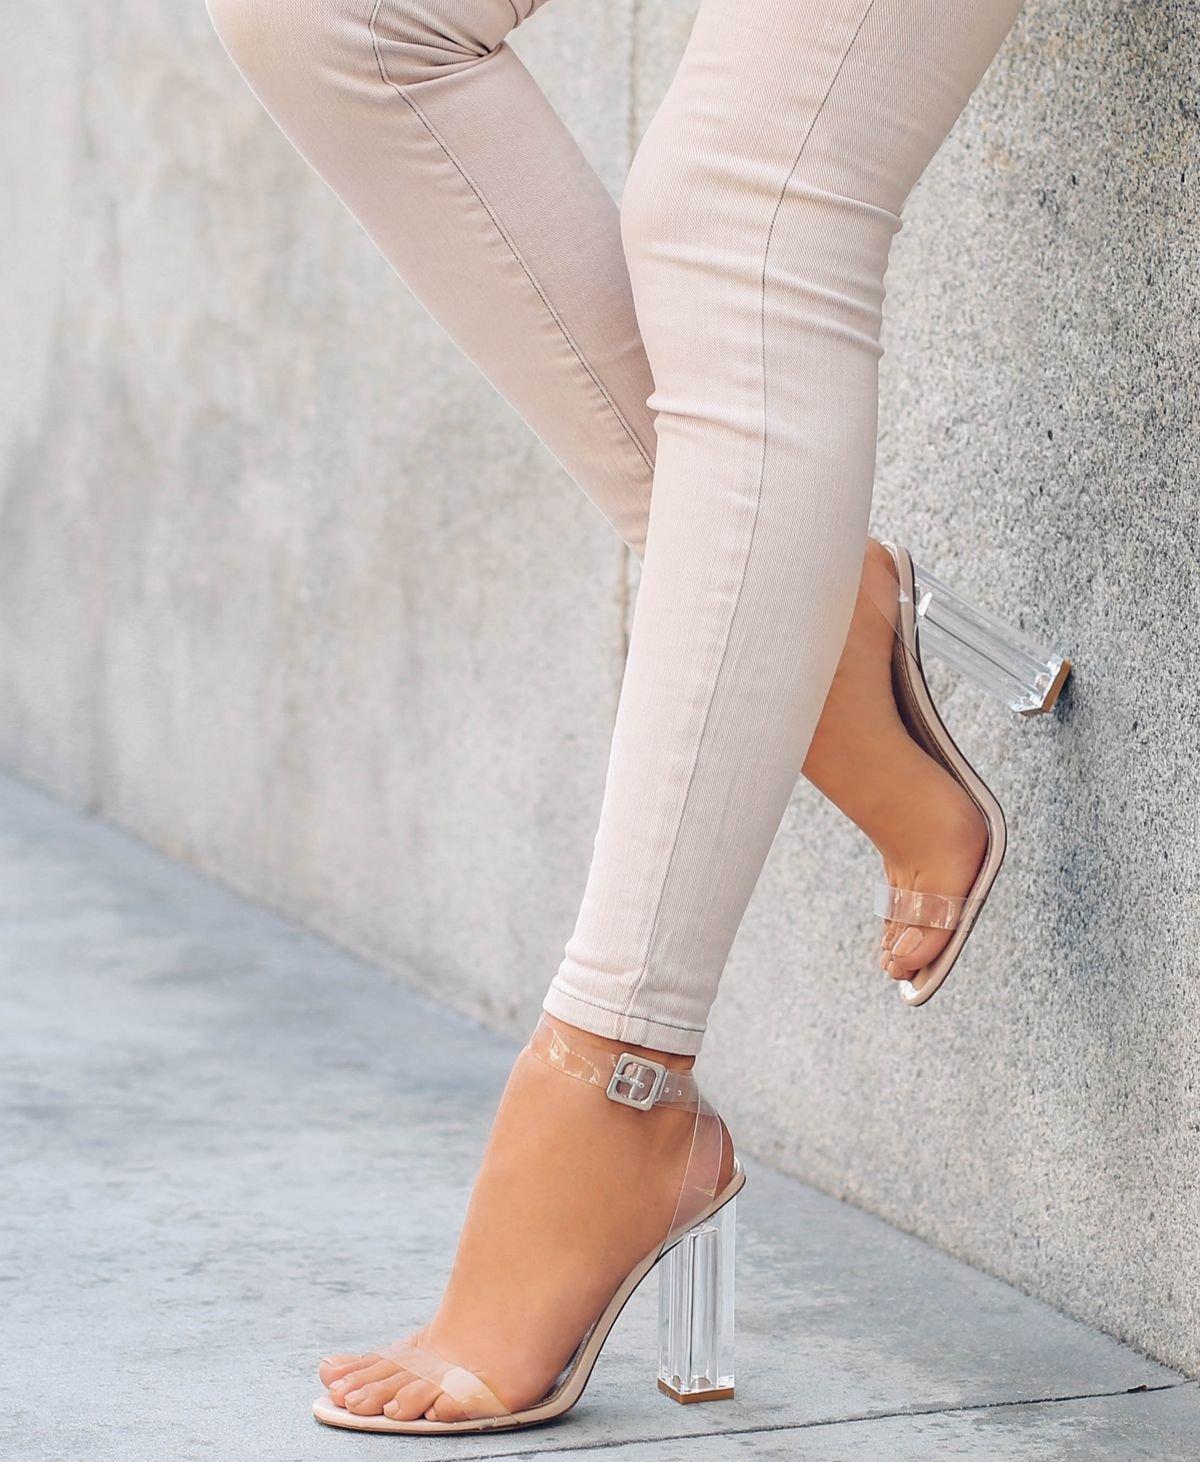 transparente Schuhe tragen Sommer Sandaletten